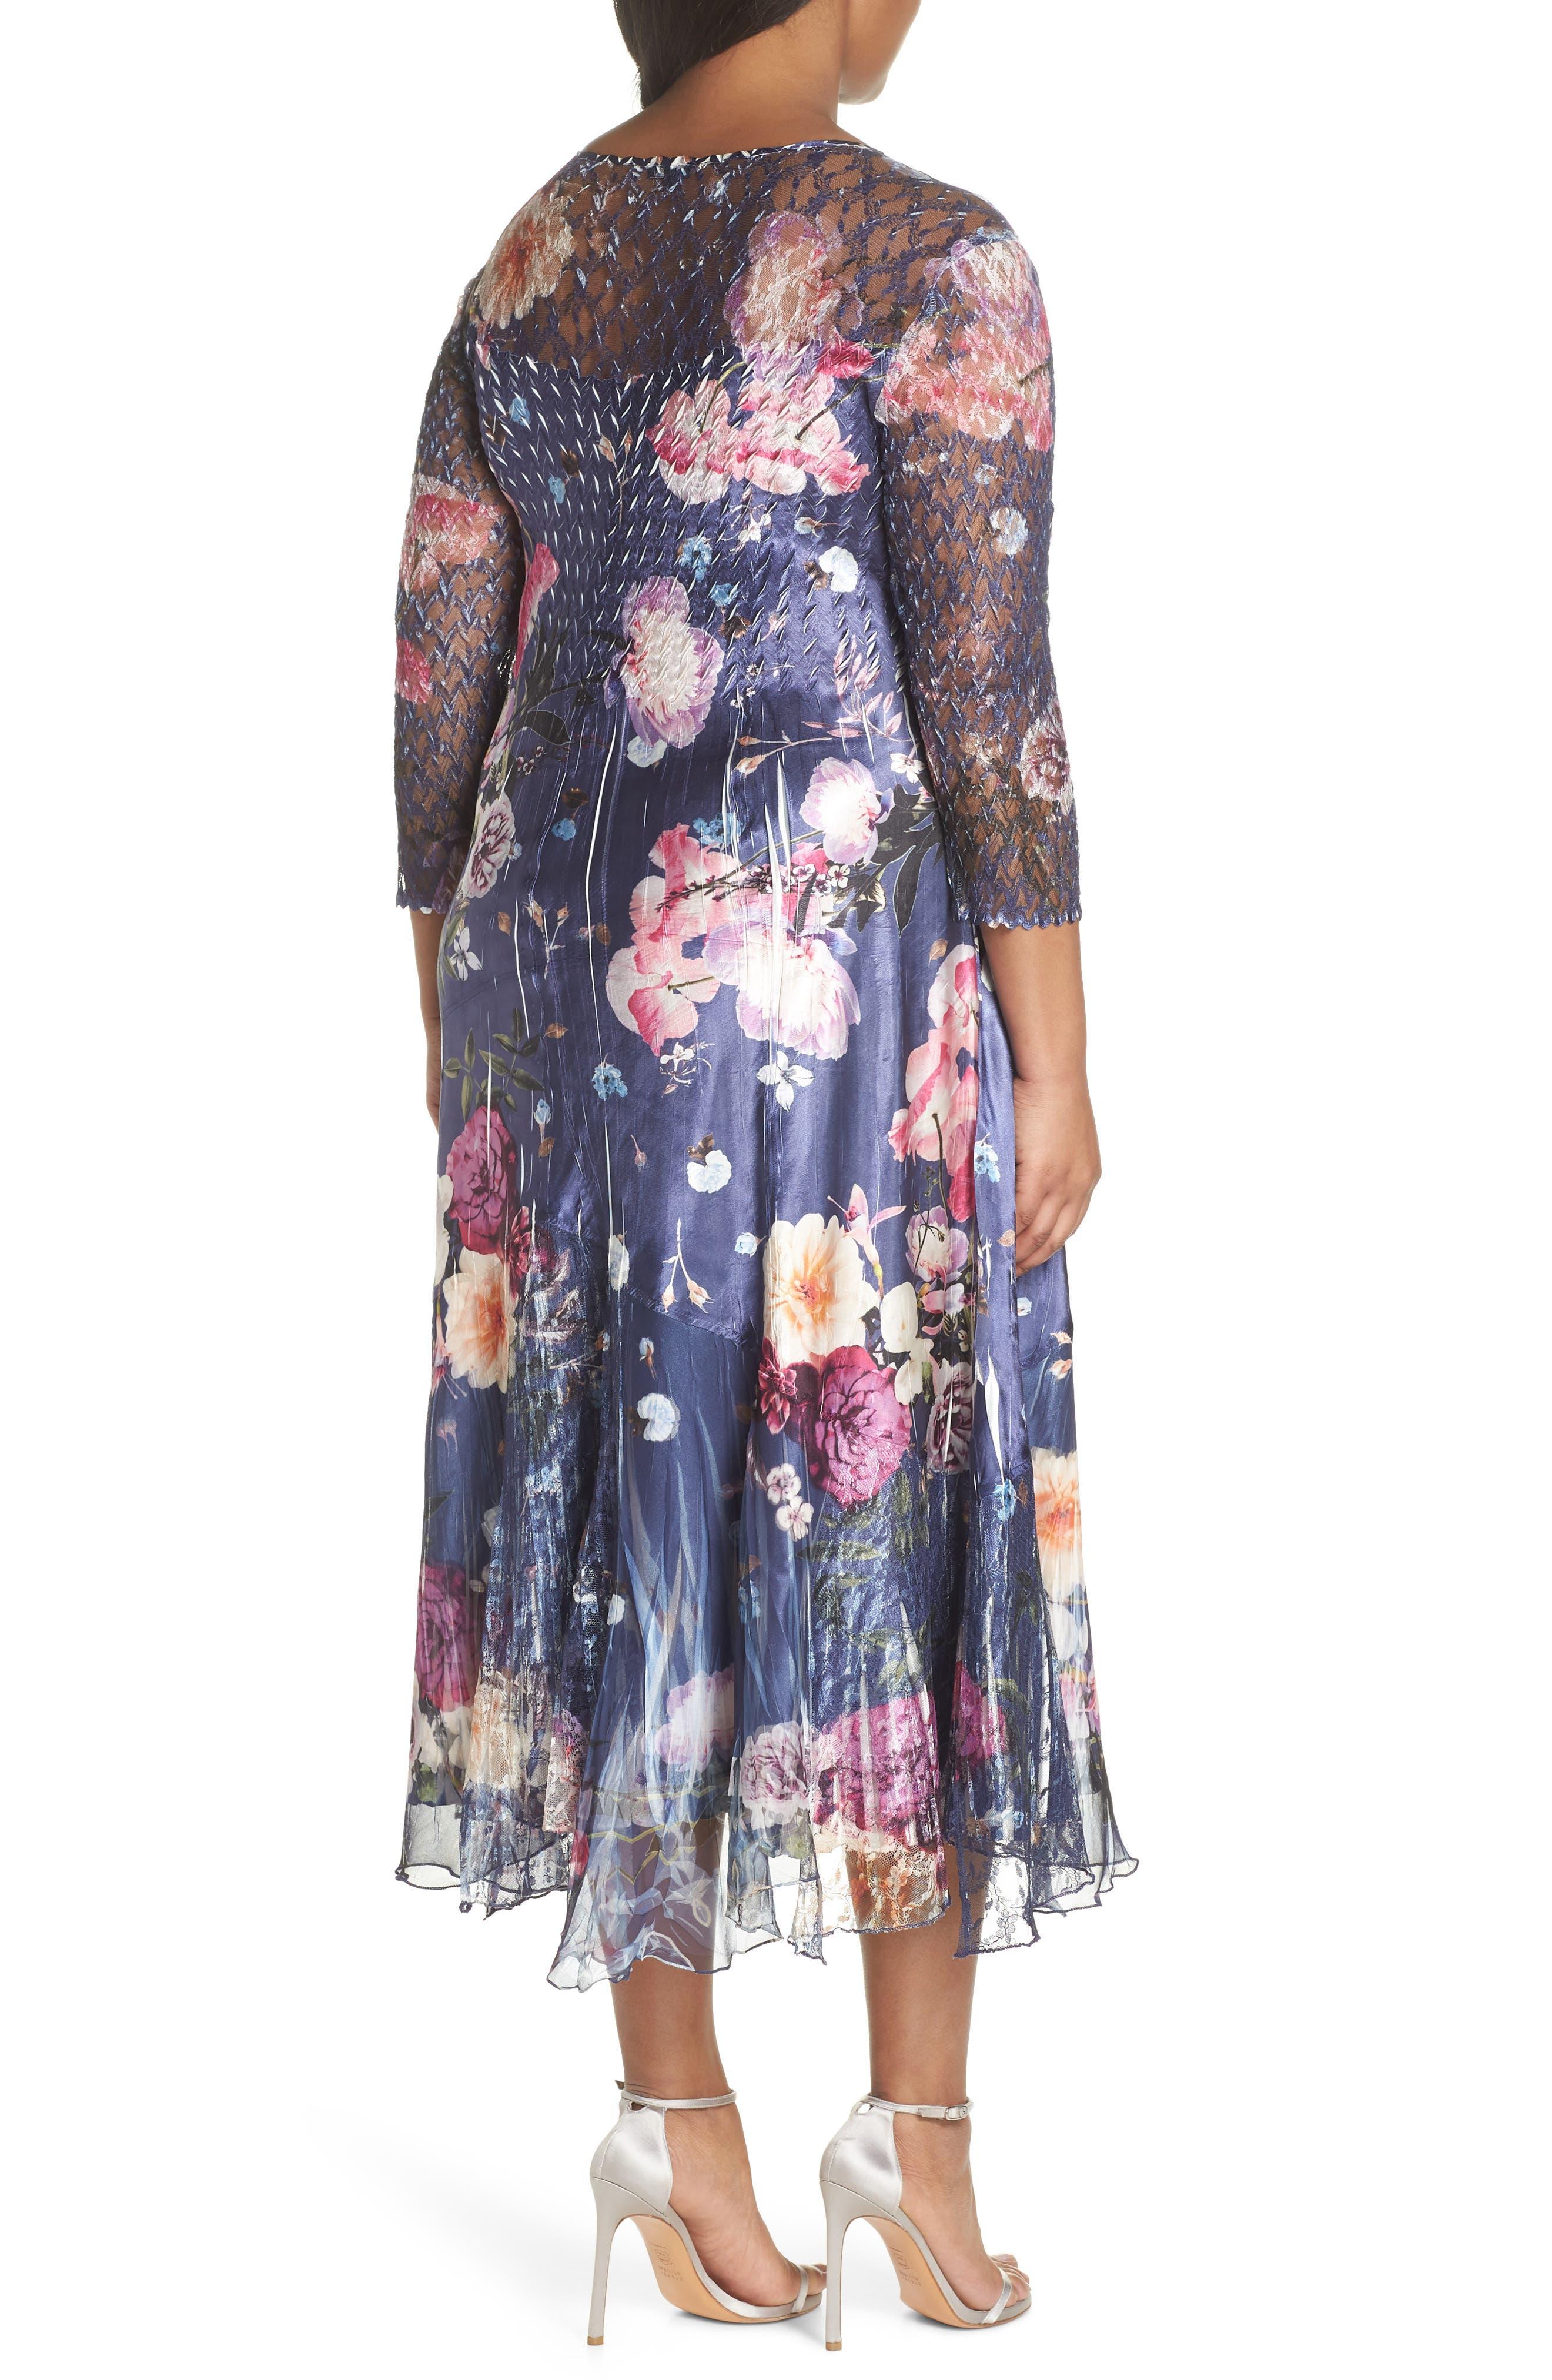 Koramov Floral Print Lace Inset Dress,                             Alternate thumbnail 2, color,                             500